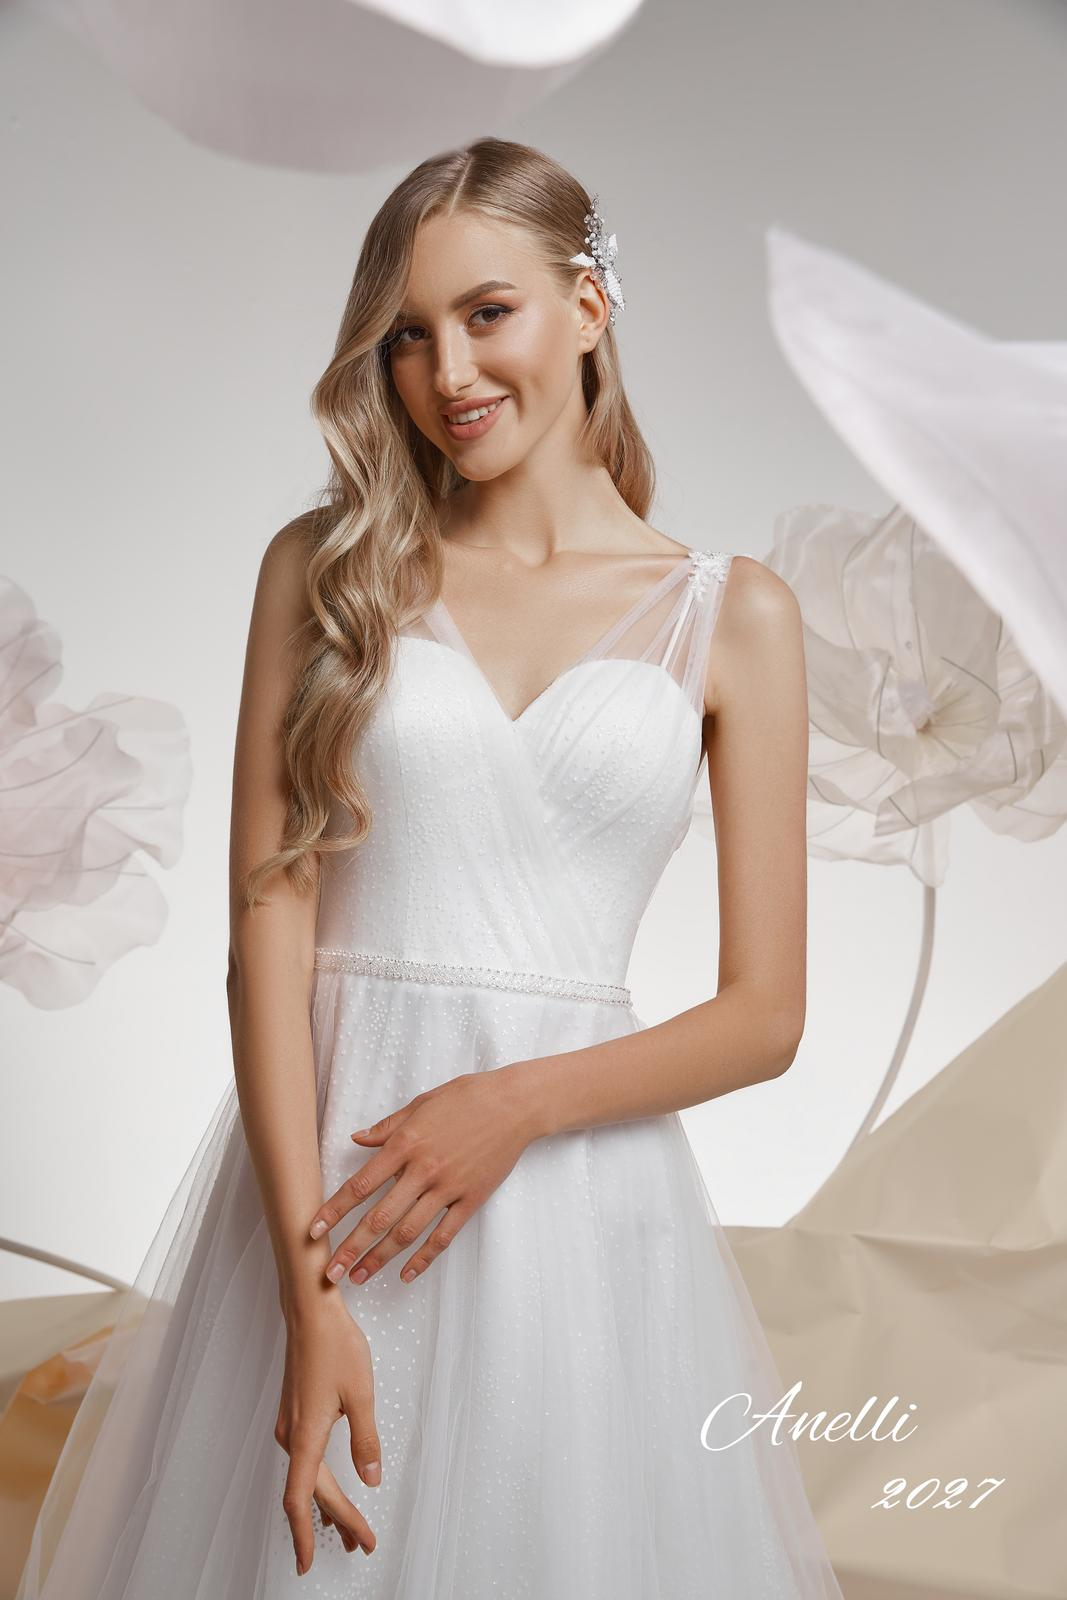 Svadobné šaty - Imagine 2027 - Obrázok č. 3